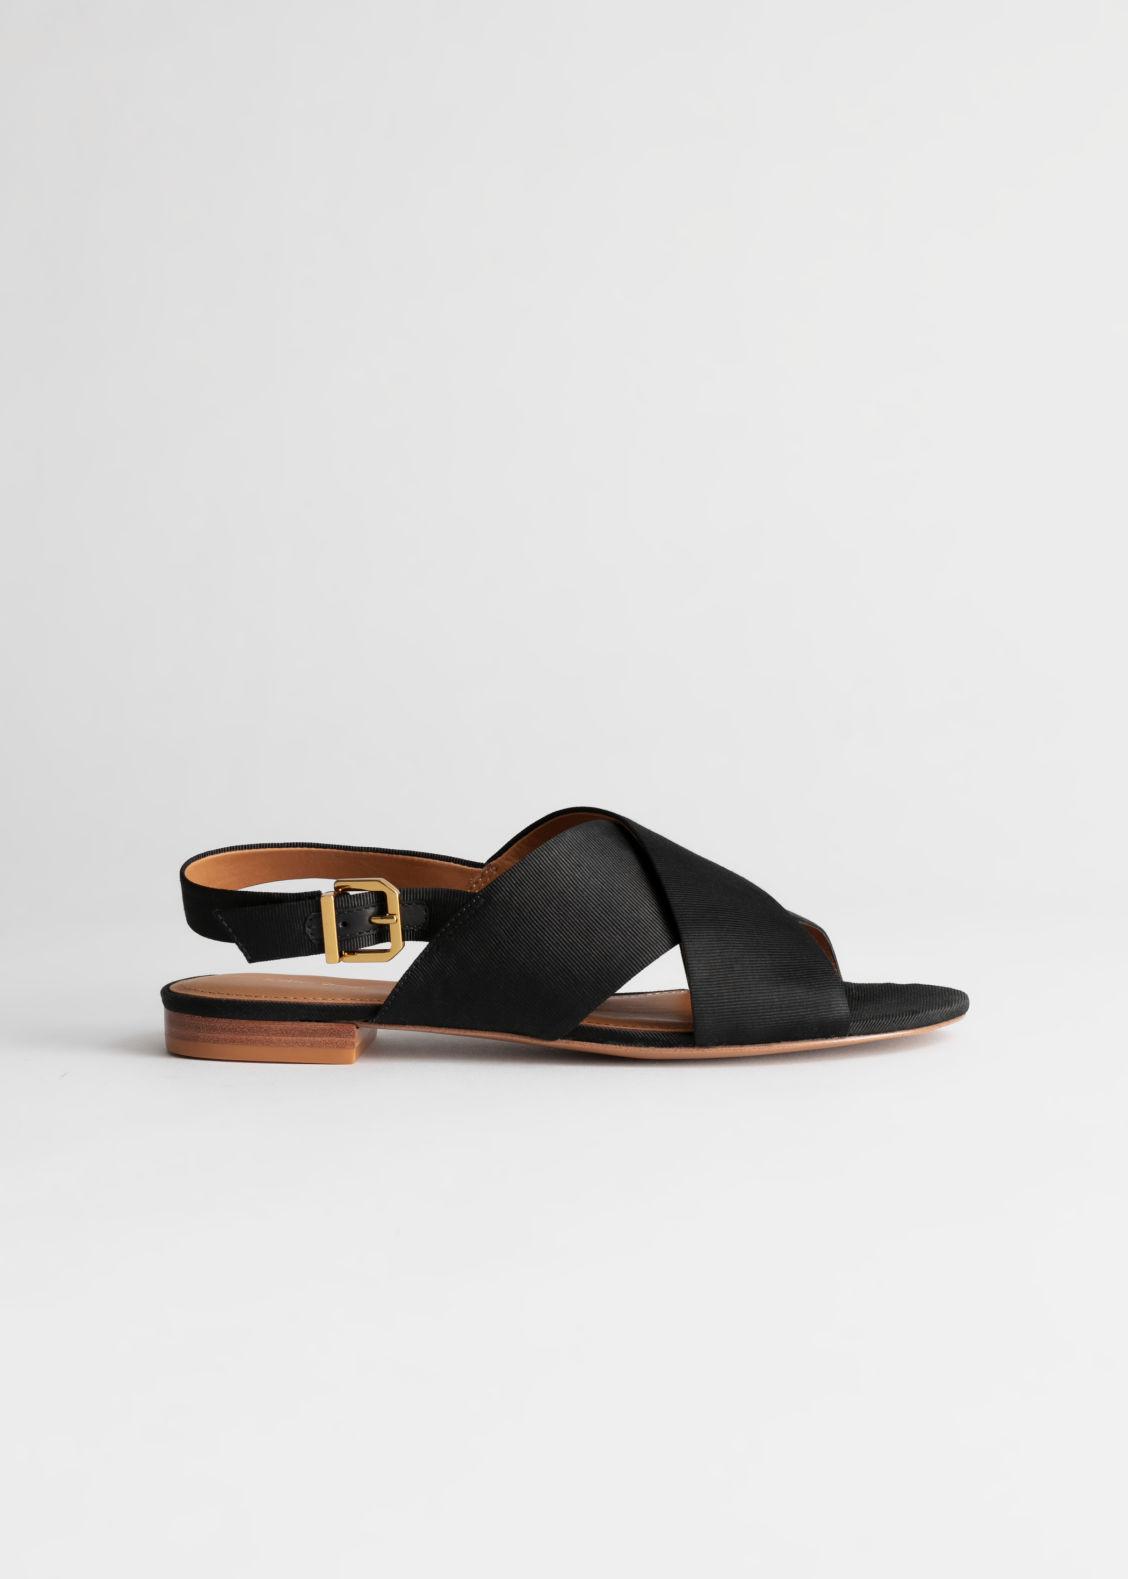 33bab81ab772 Criss Cross Slingback Sandals - Black - Flat sandals -   Other Stories